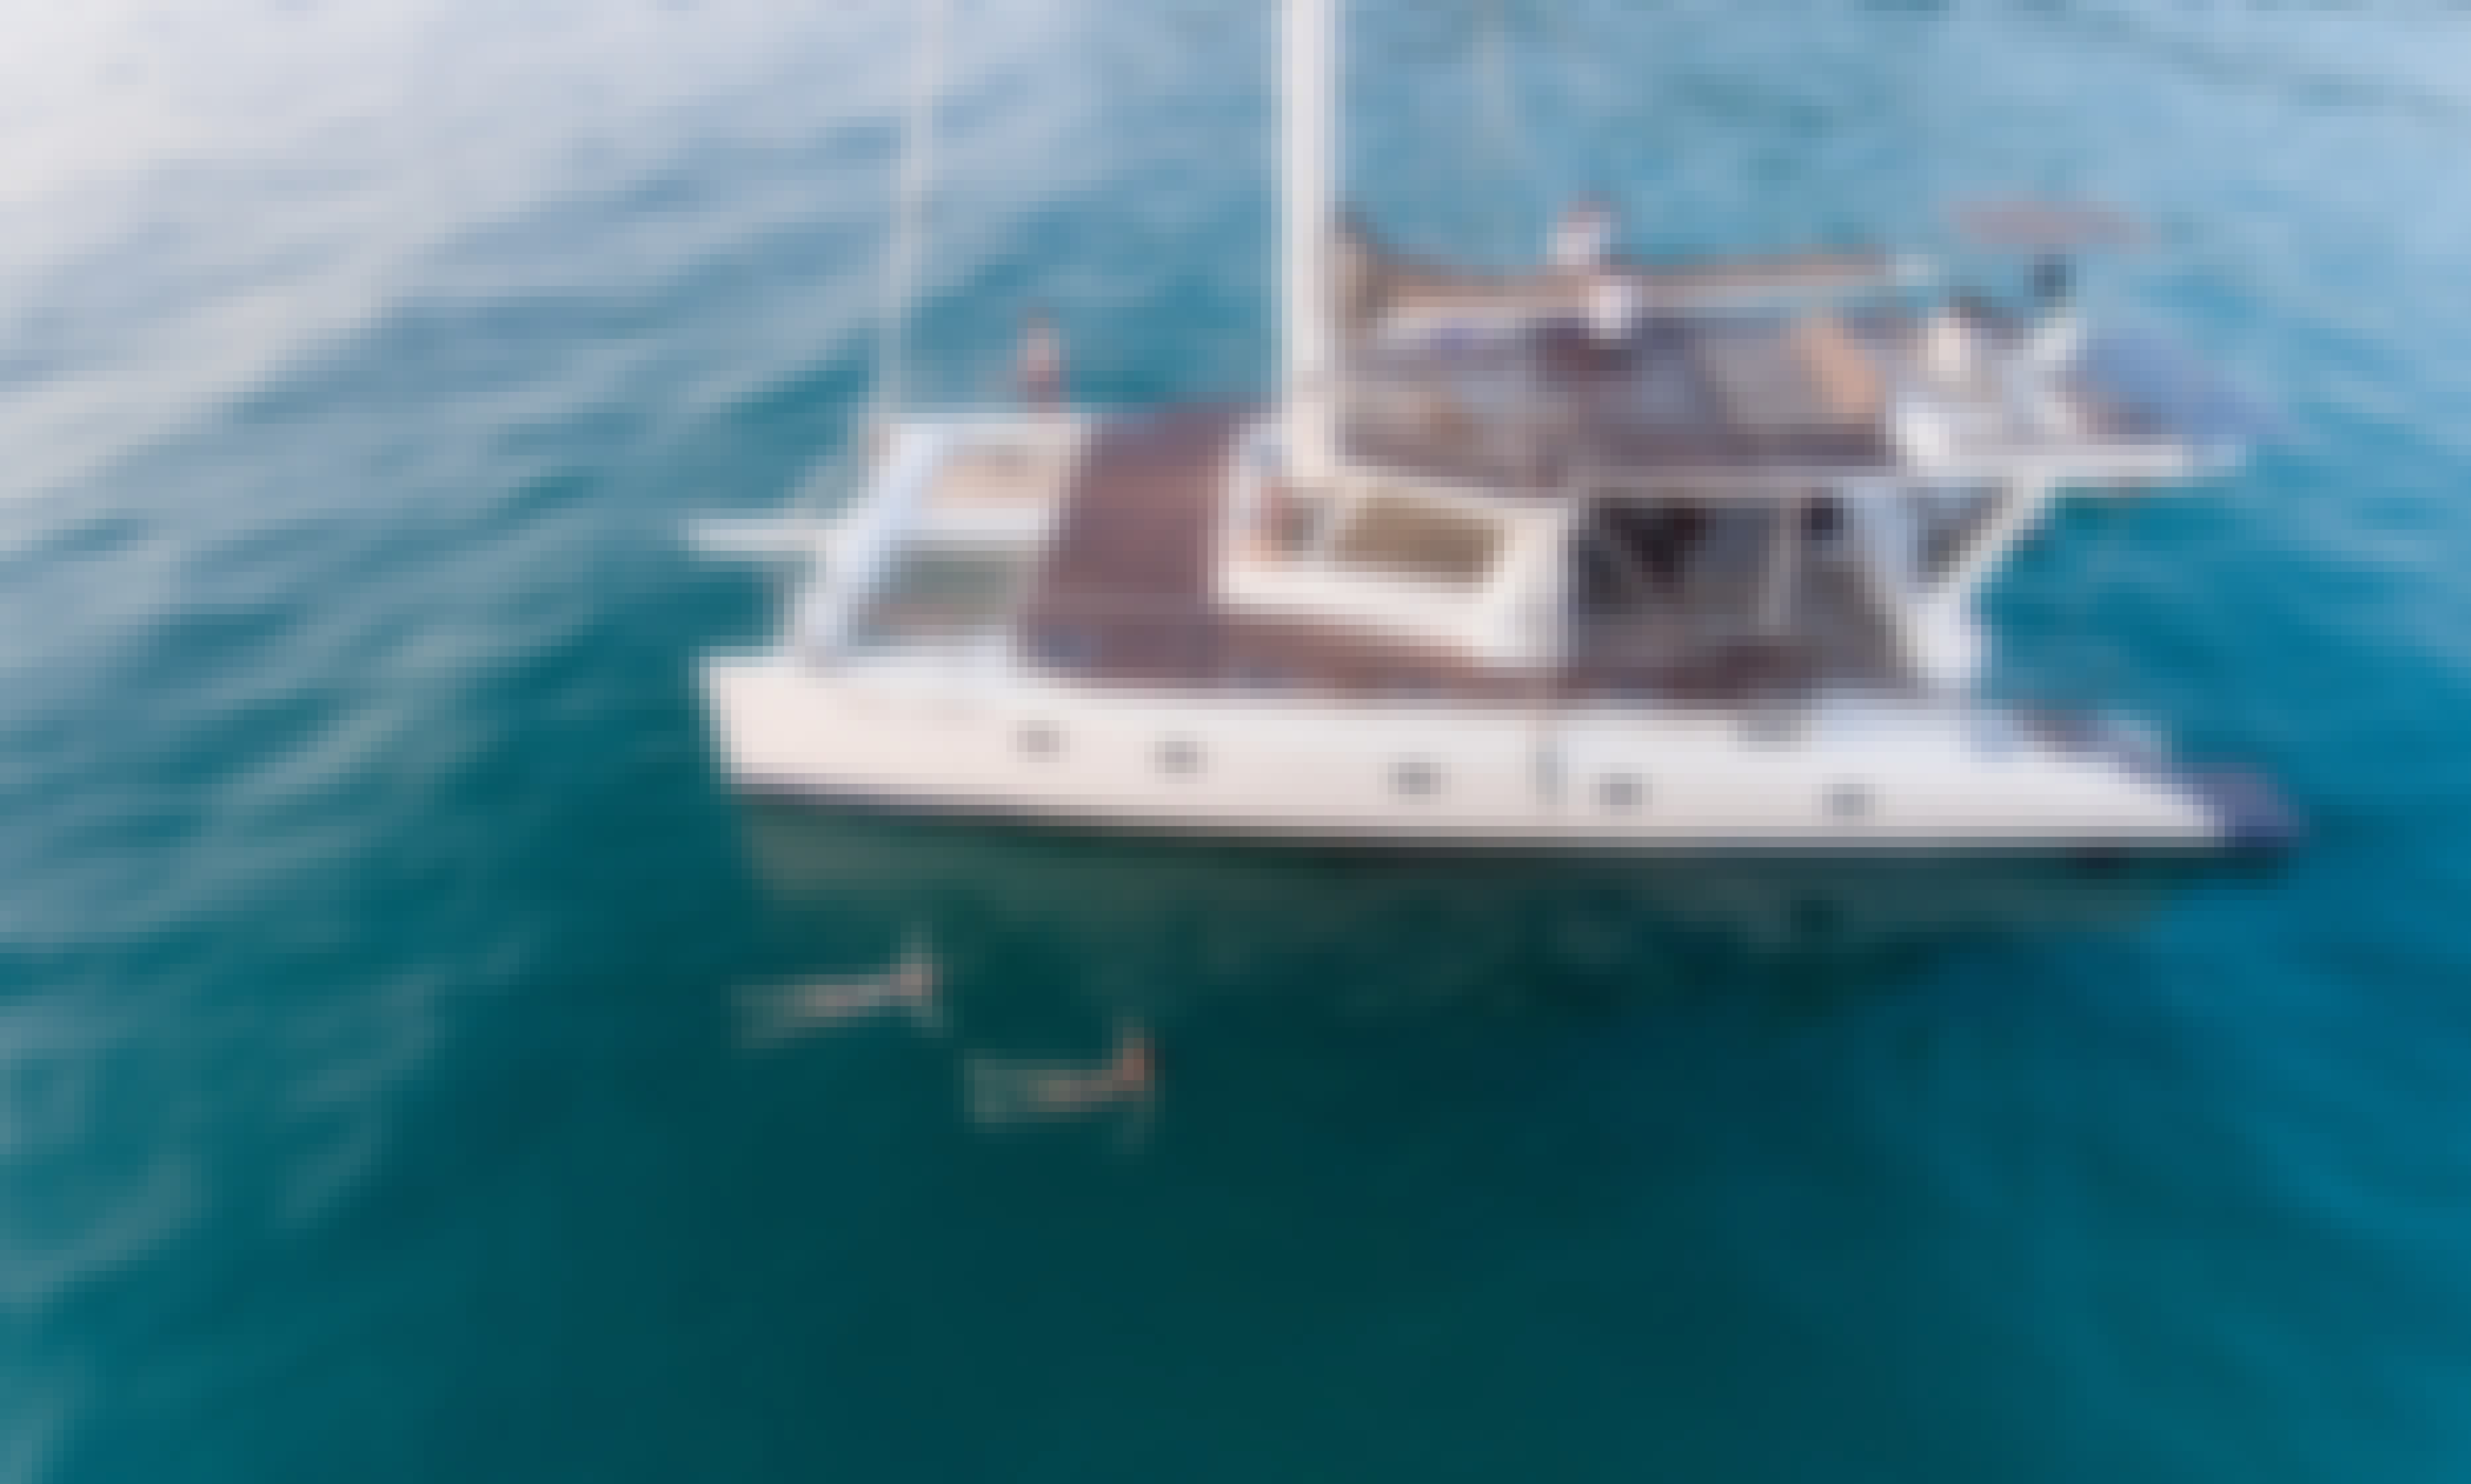 7 Hour Whale Watching Cruise on Shared Boat in Trincomalee, Sri Lanka (No bareboat charter)